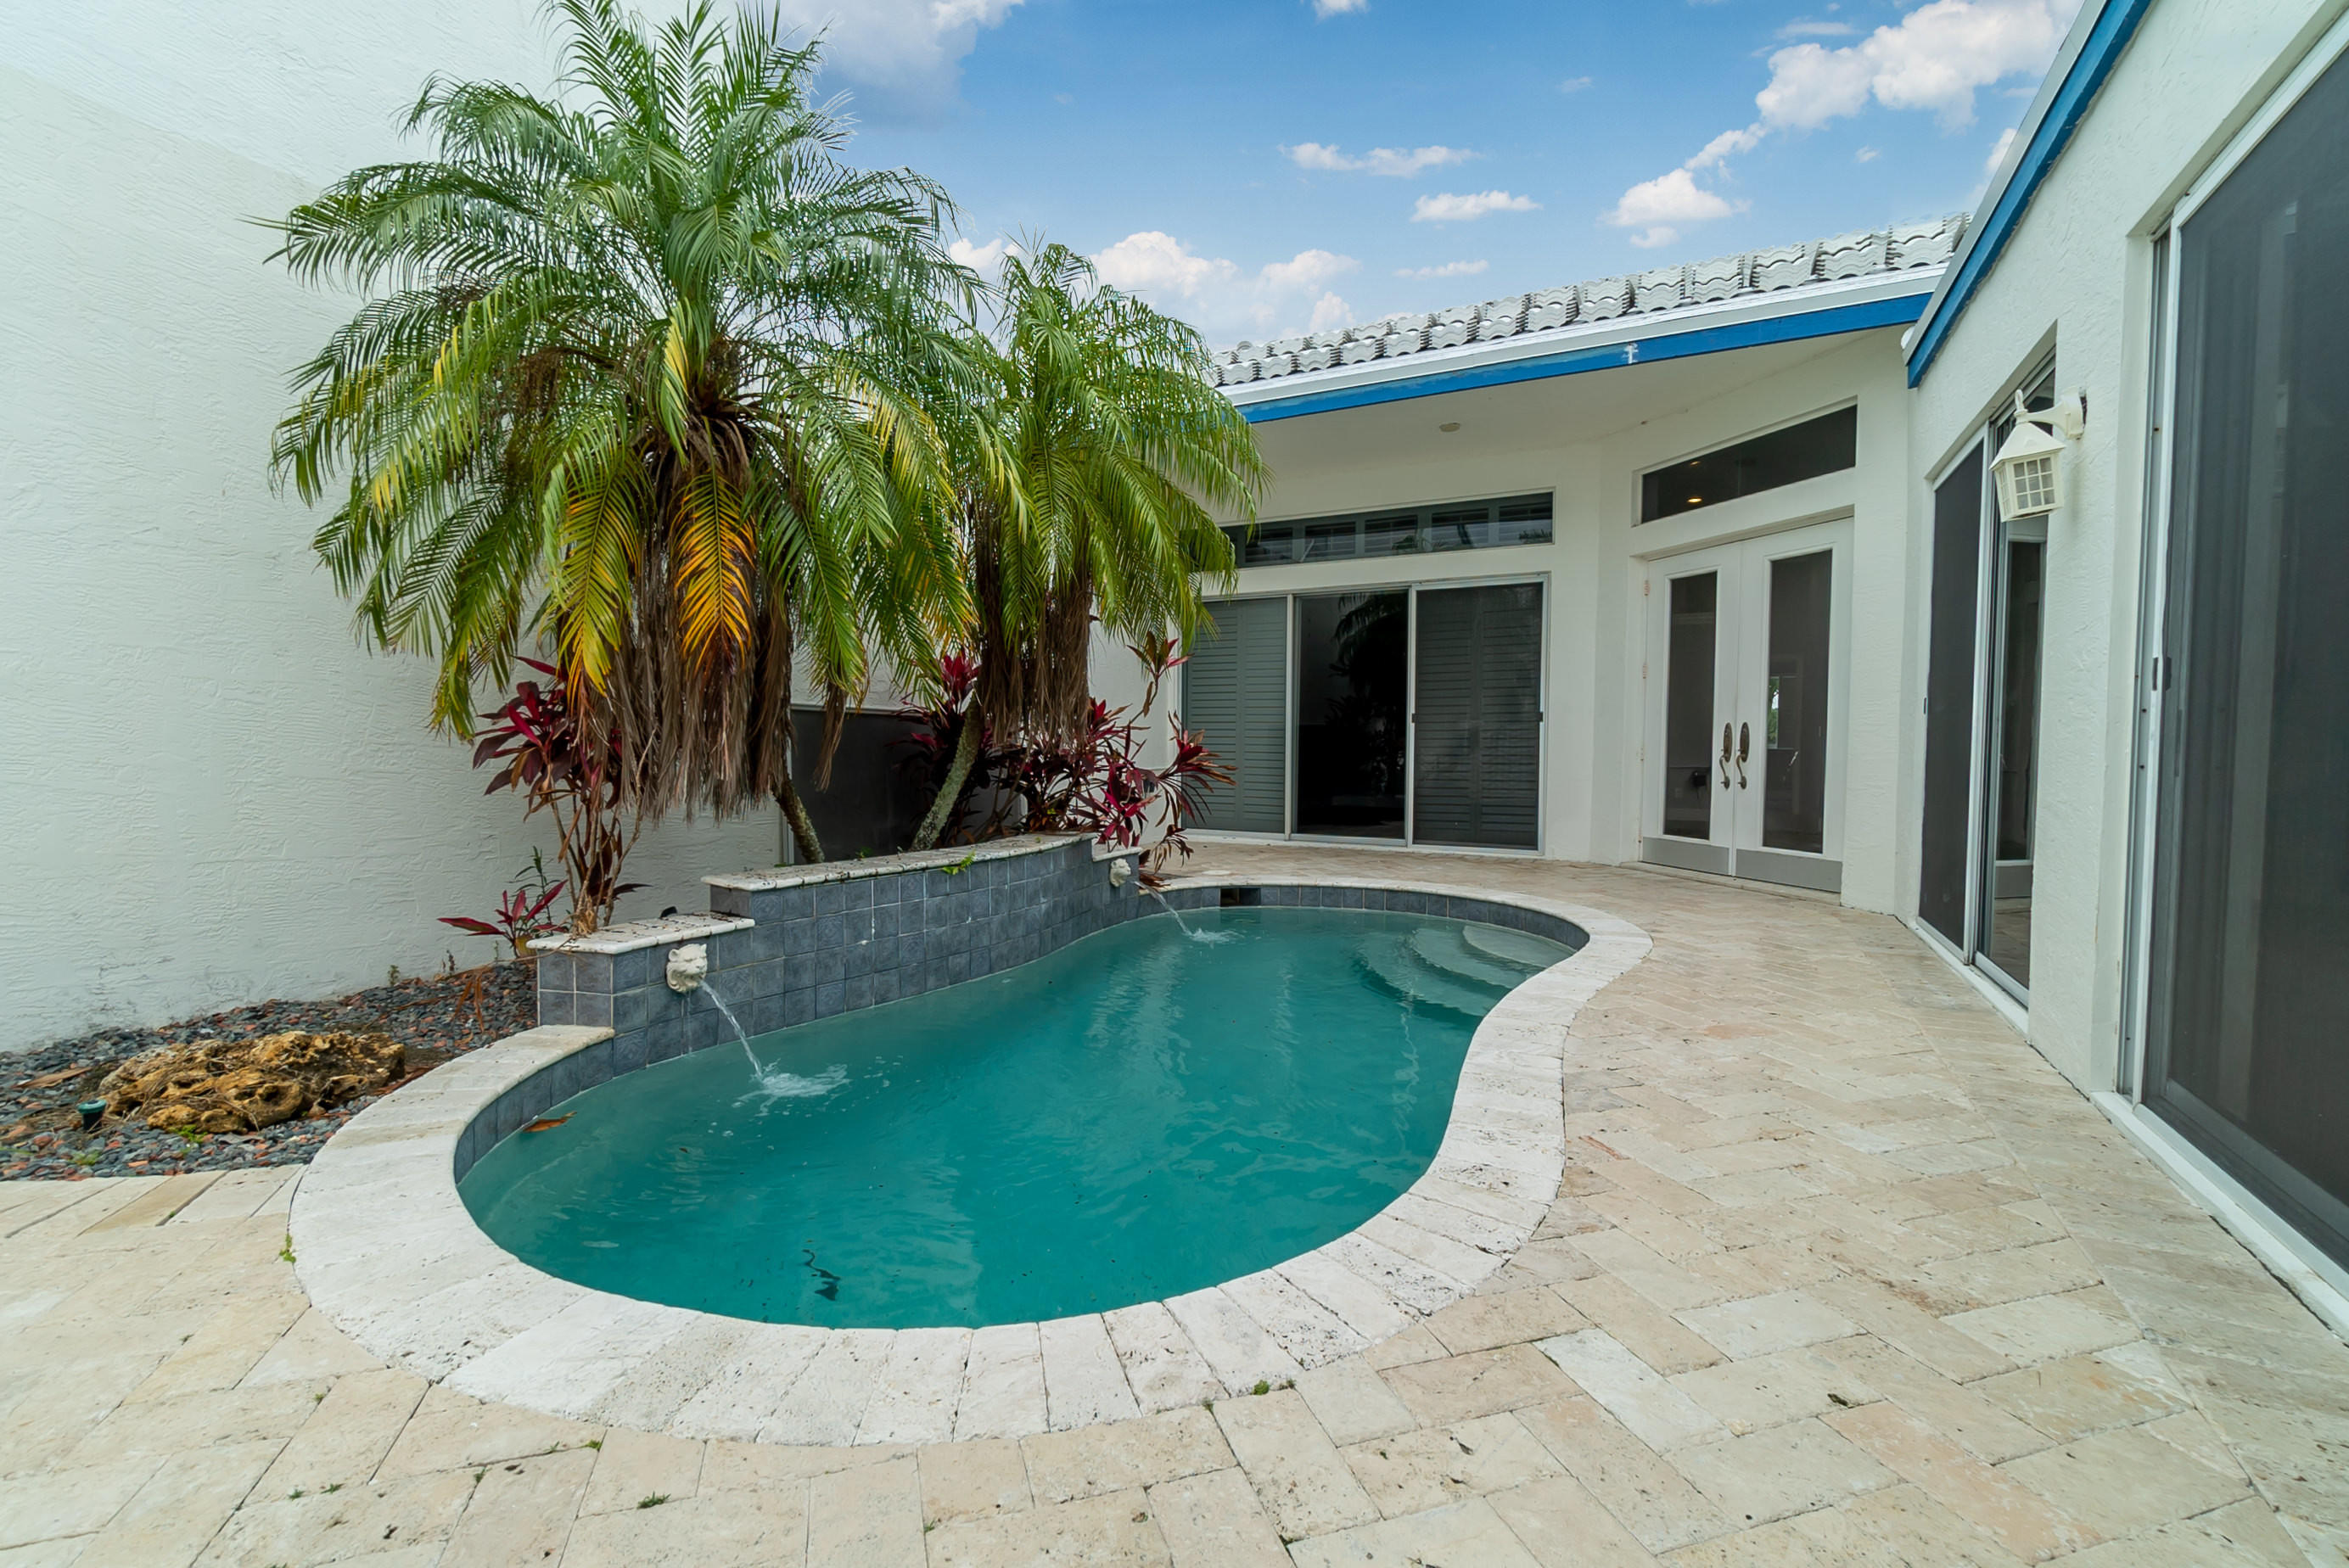 Photo of 3699 Mykonos Court, Boca Raton, FL 33487